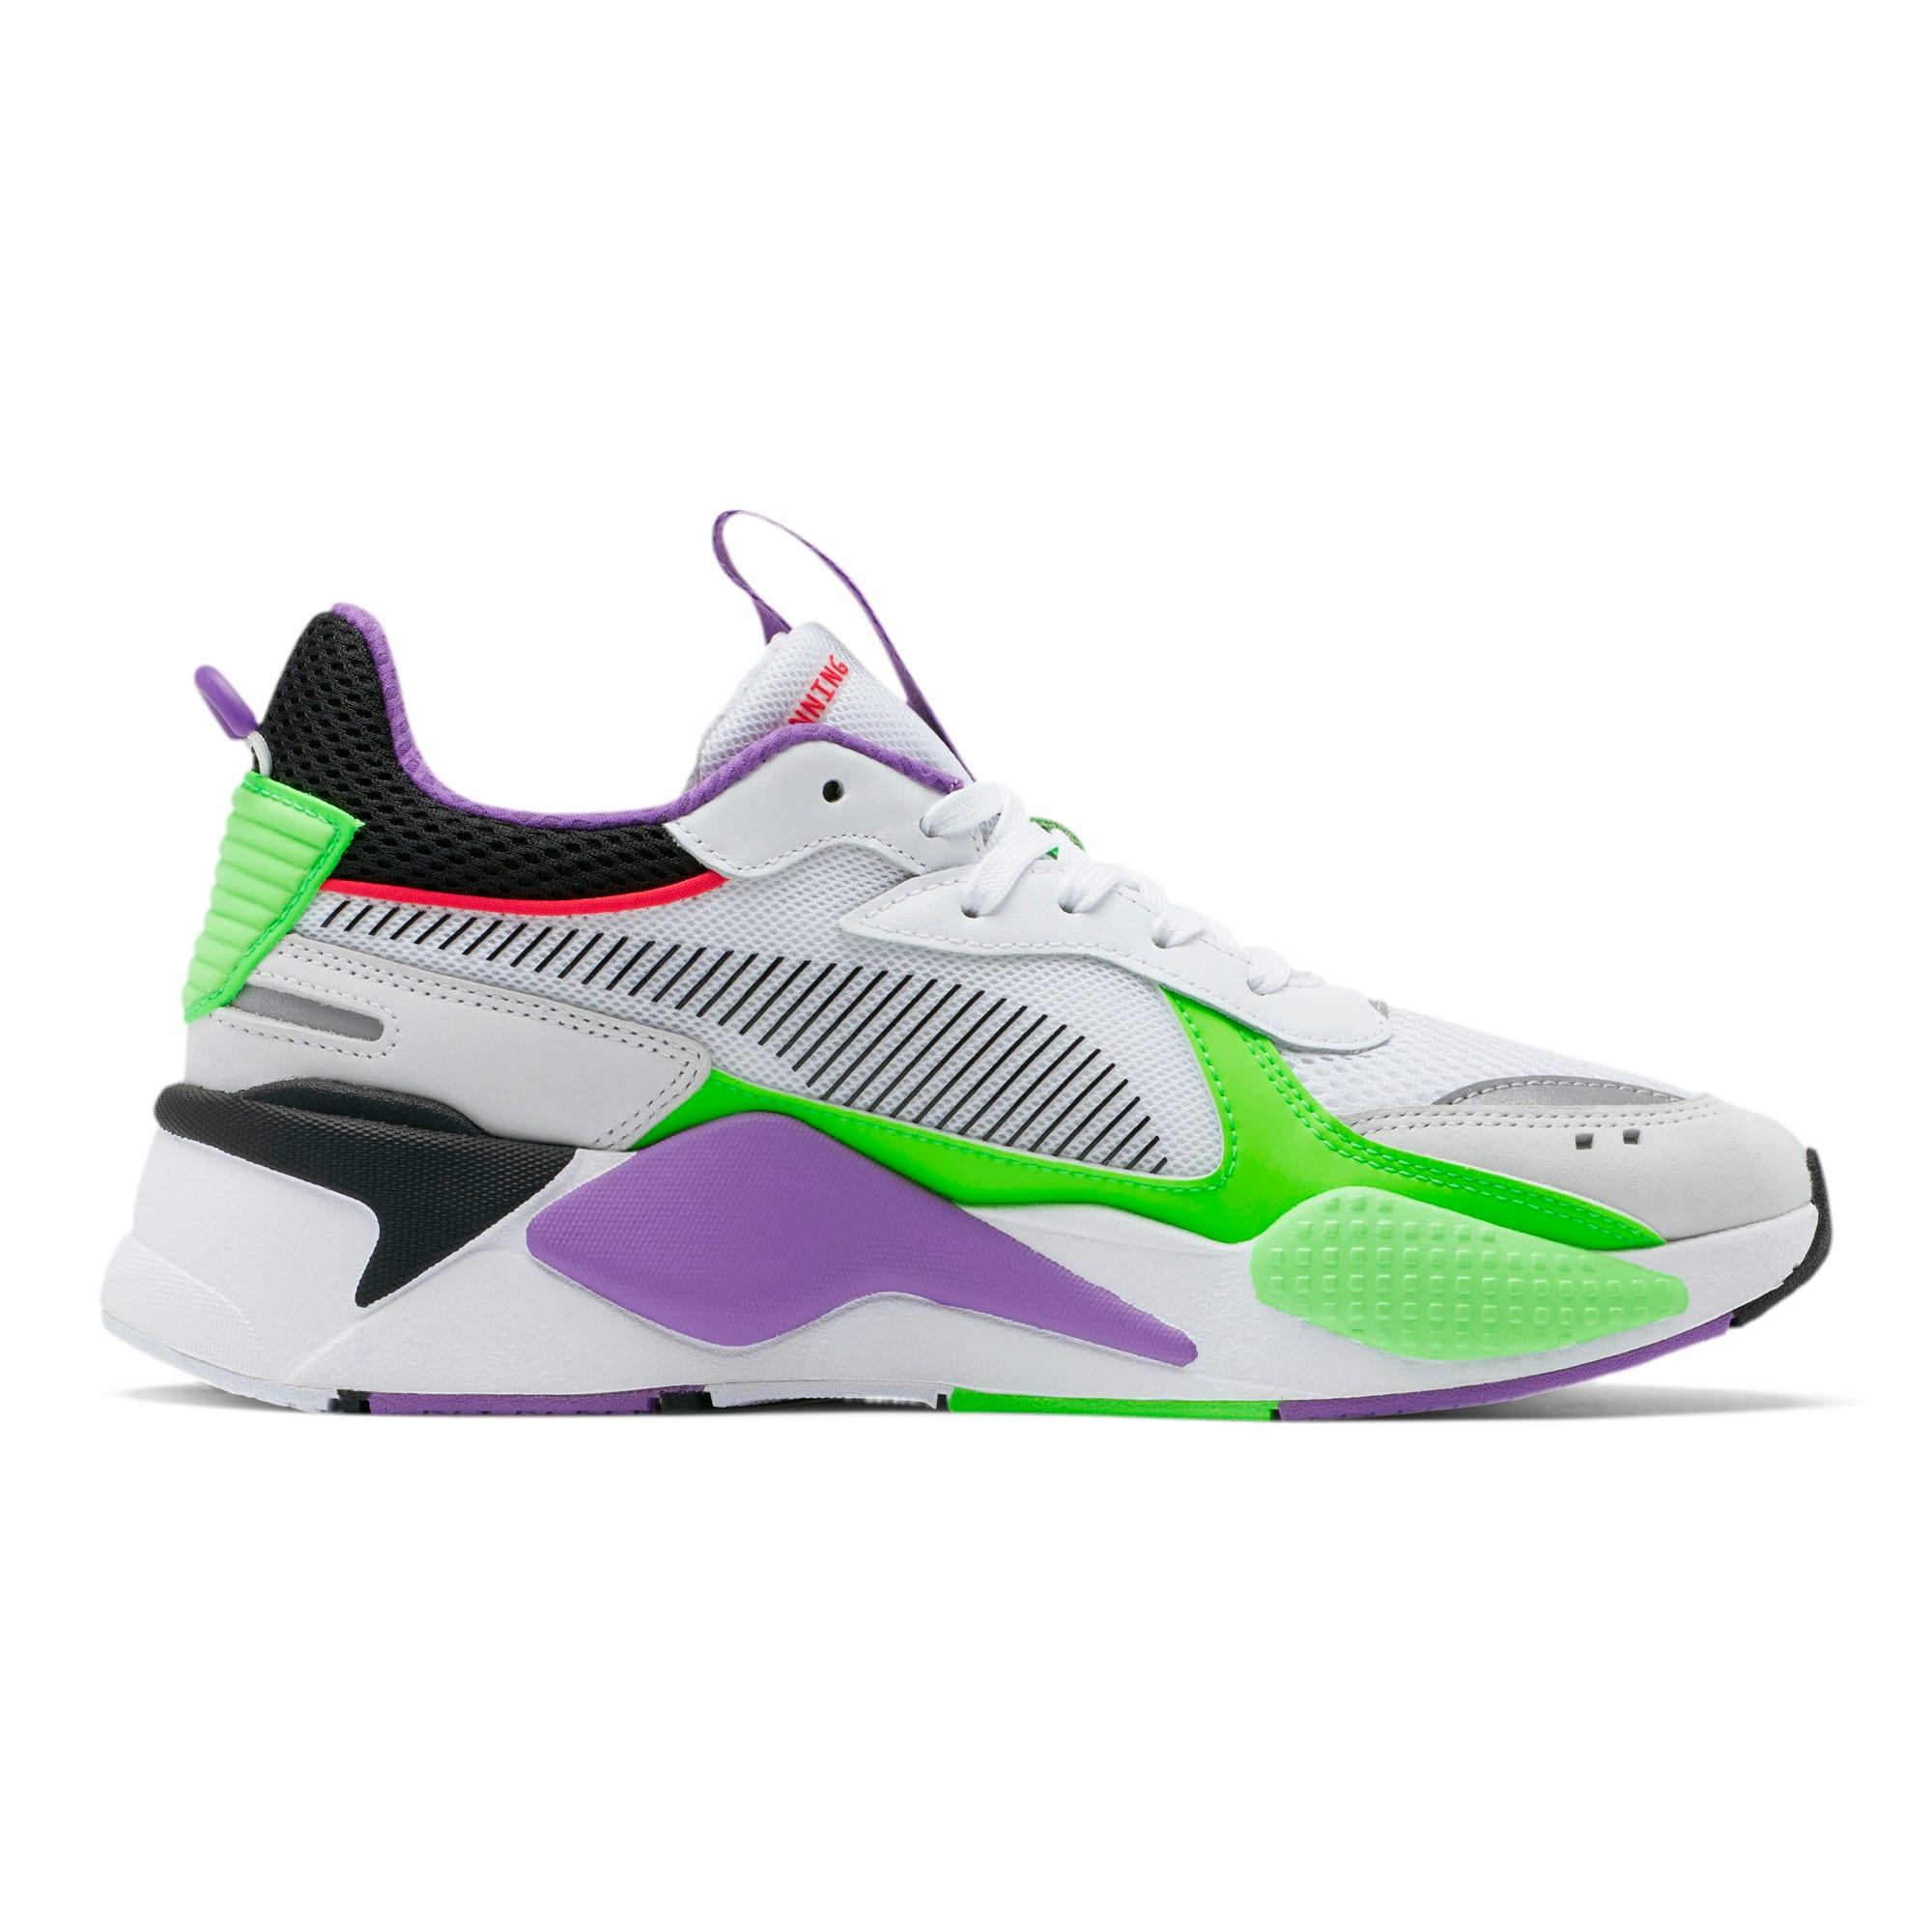 Thumbnail 5 of RS-X Bold Sneakers, PWhite-Gr Gecko-Royal Lilac, medium